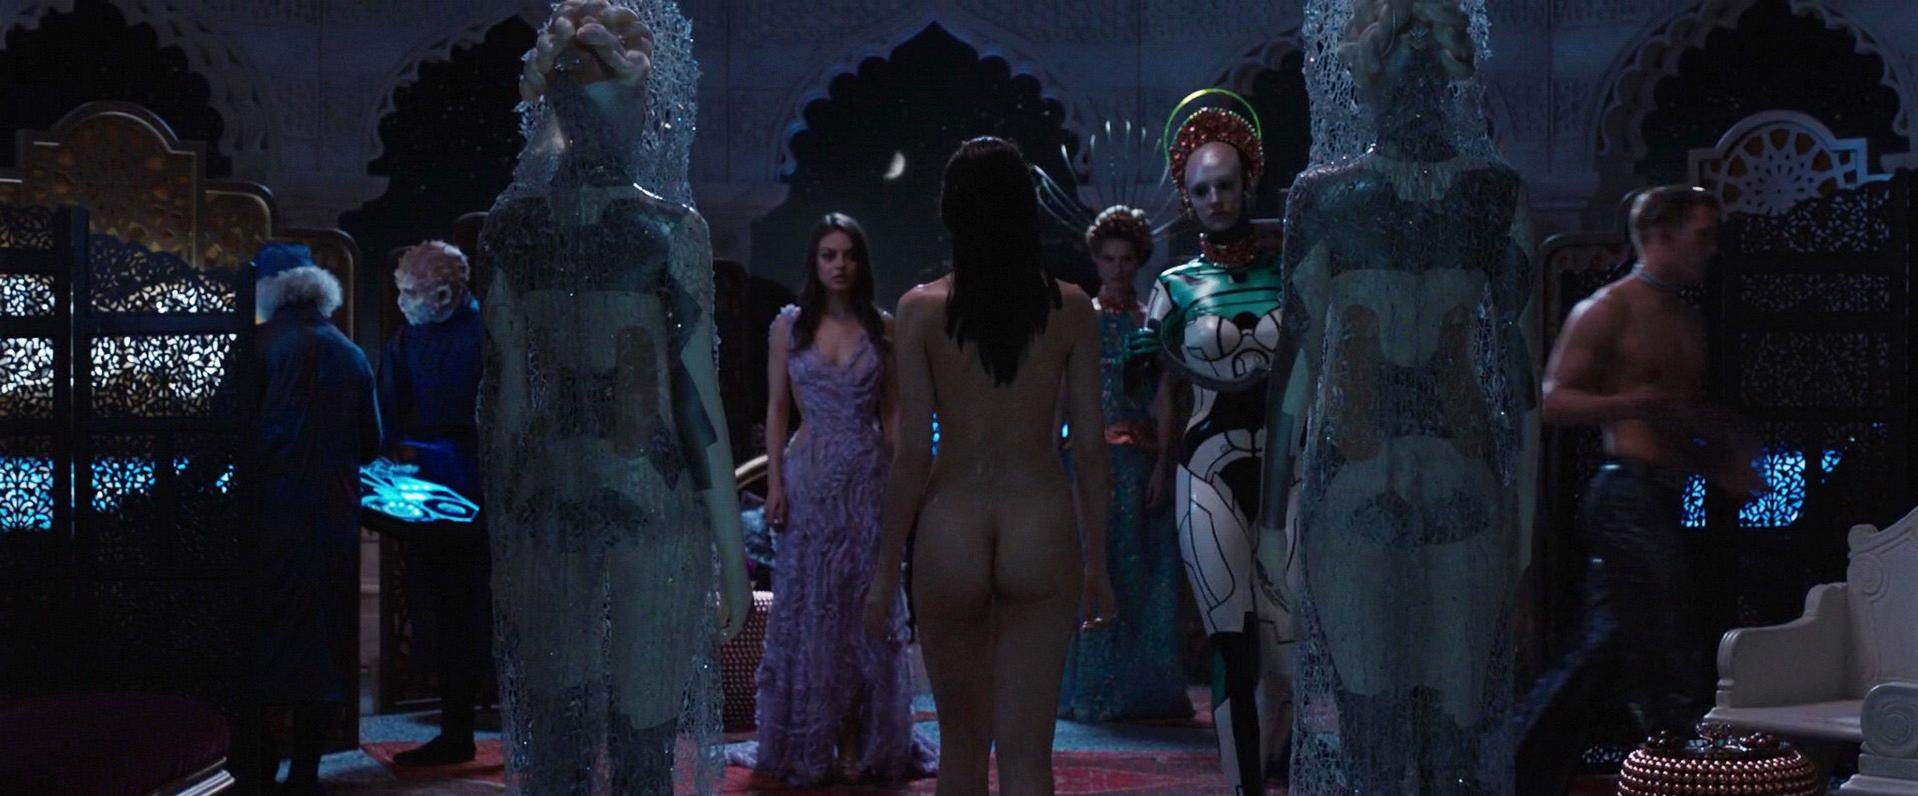 Tuppence Middleton nude, Vanessa Kirby sexy - Jupiter Ascending (2015)